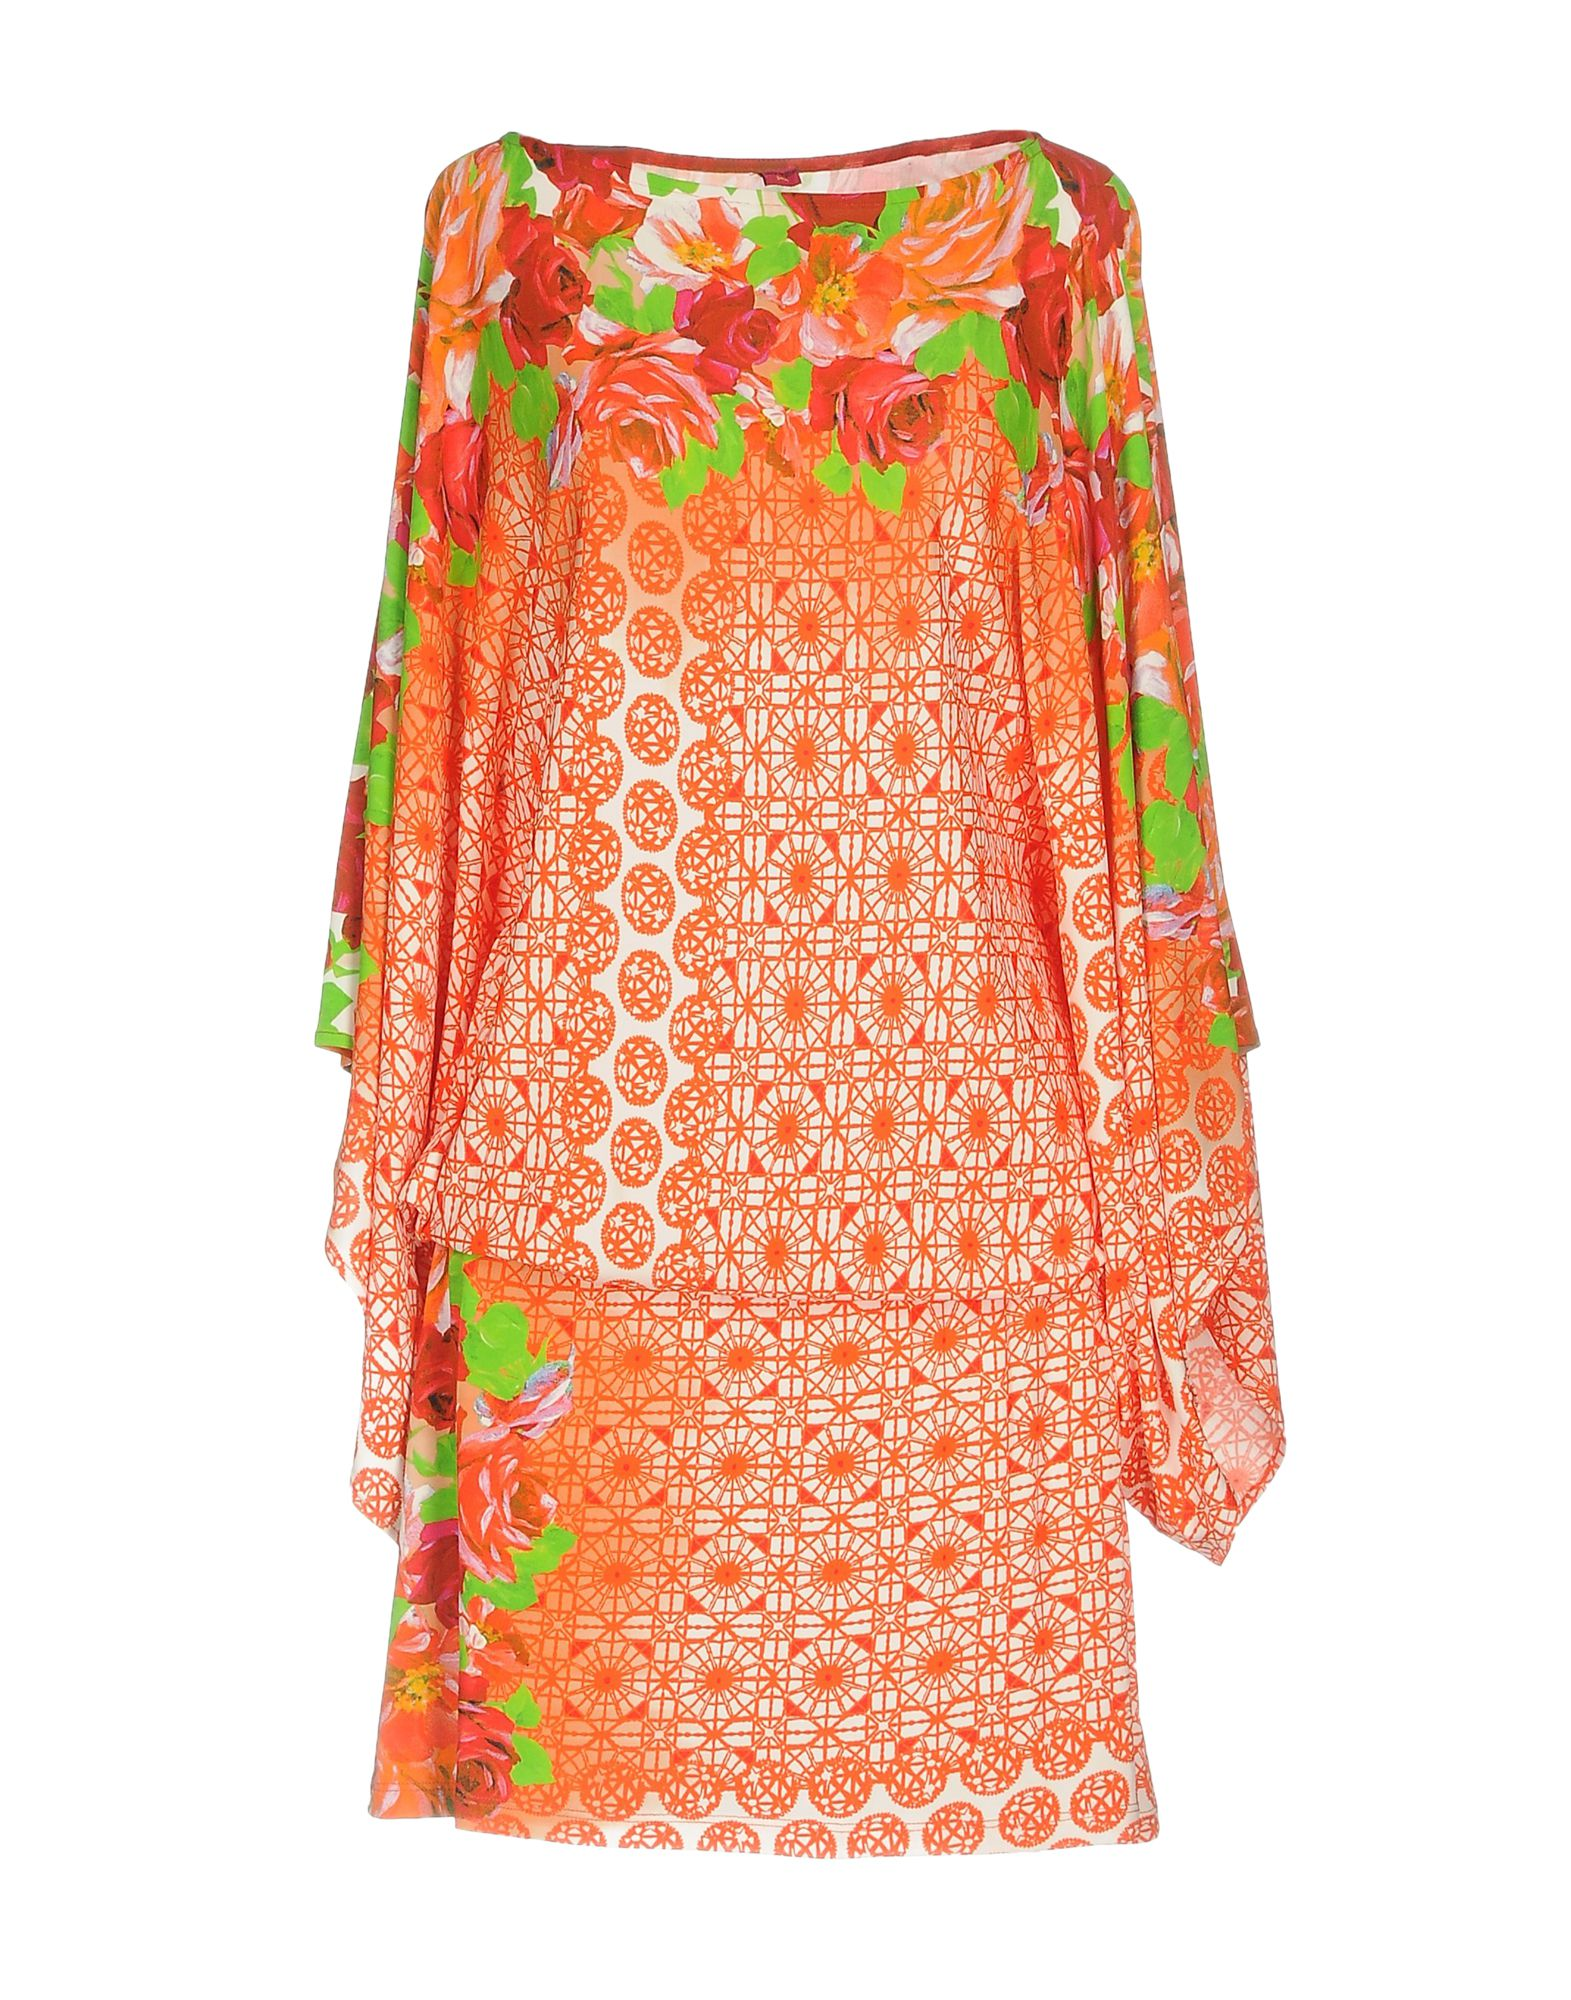 SAVE THE QUEEN! SUN Короткое платье платье save the queen платья и сарафаны мини короткие